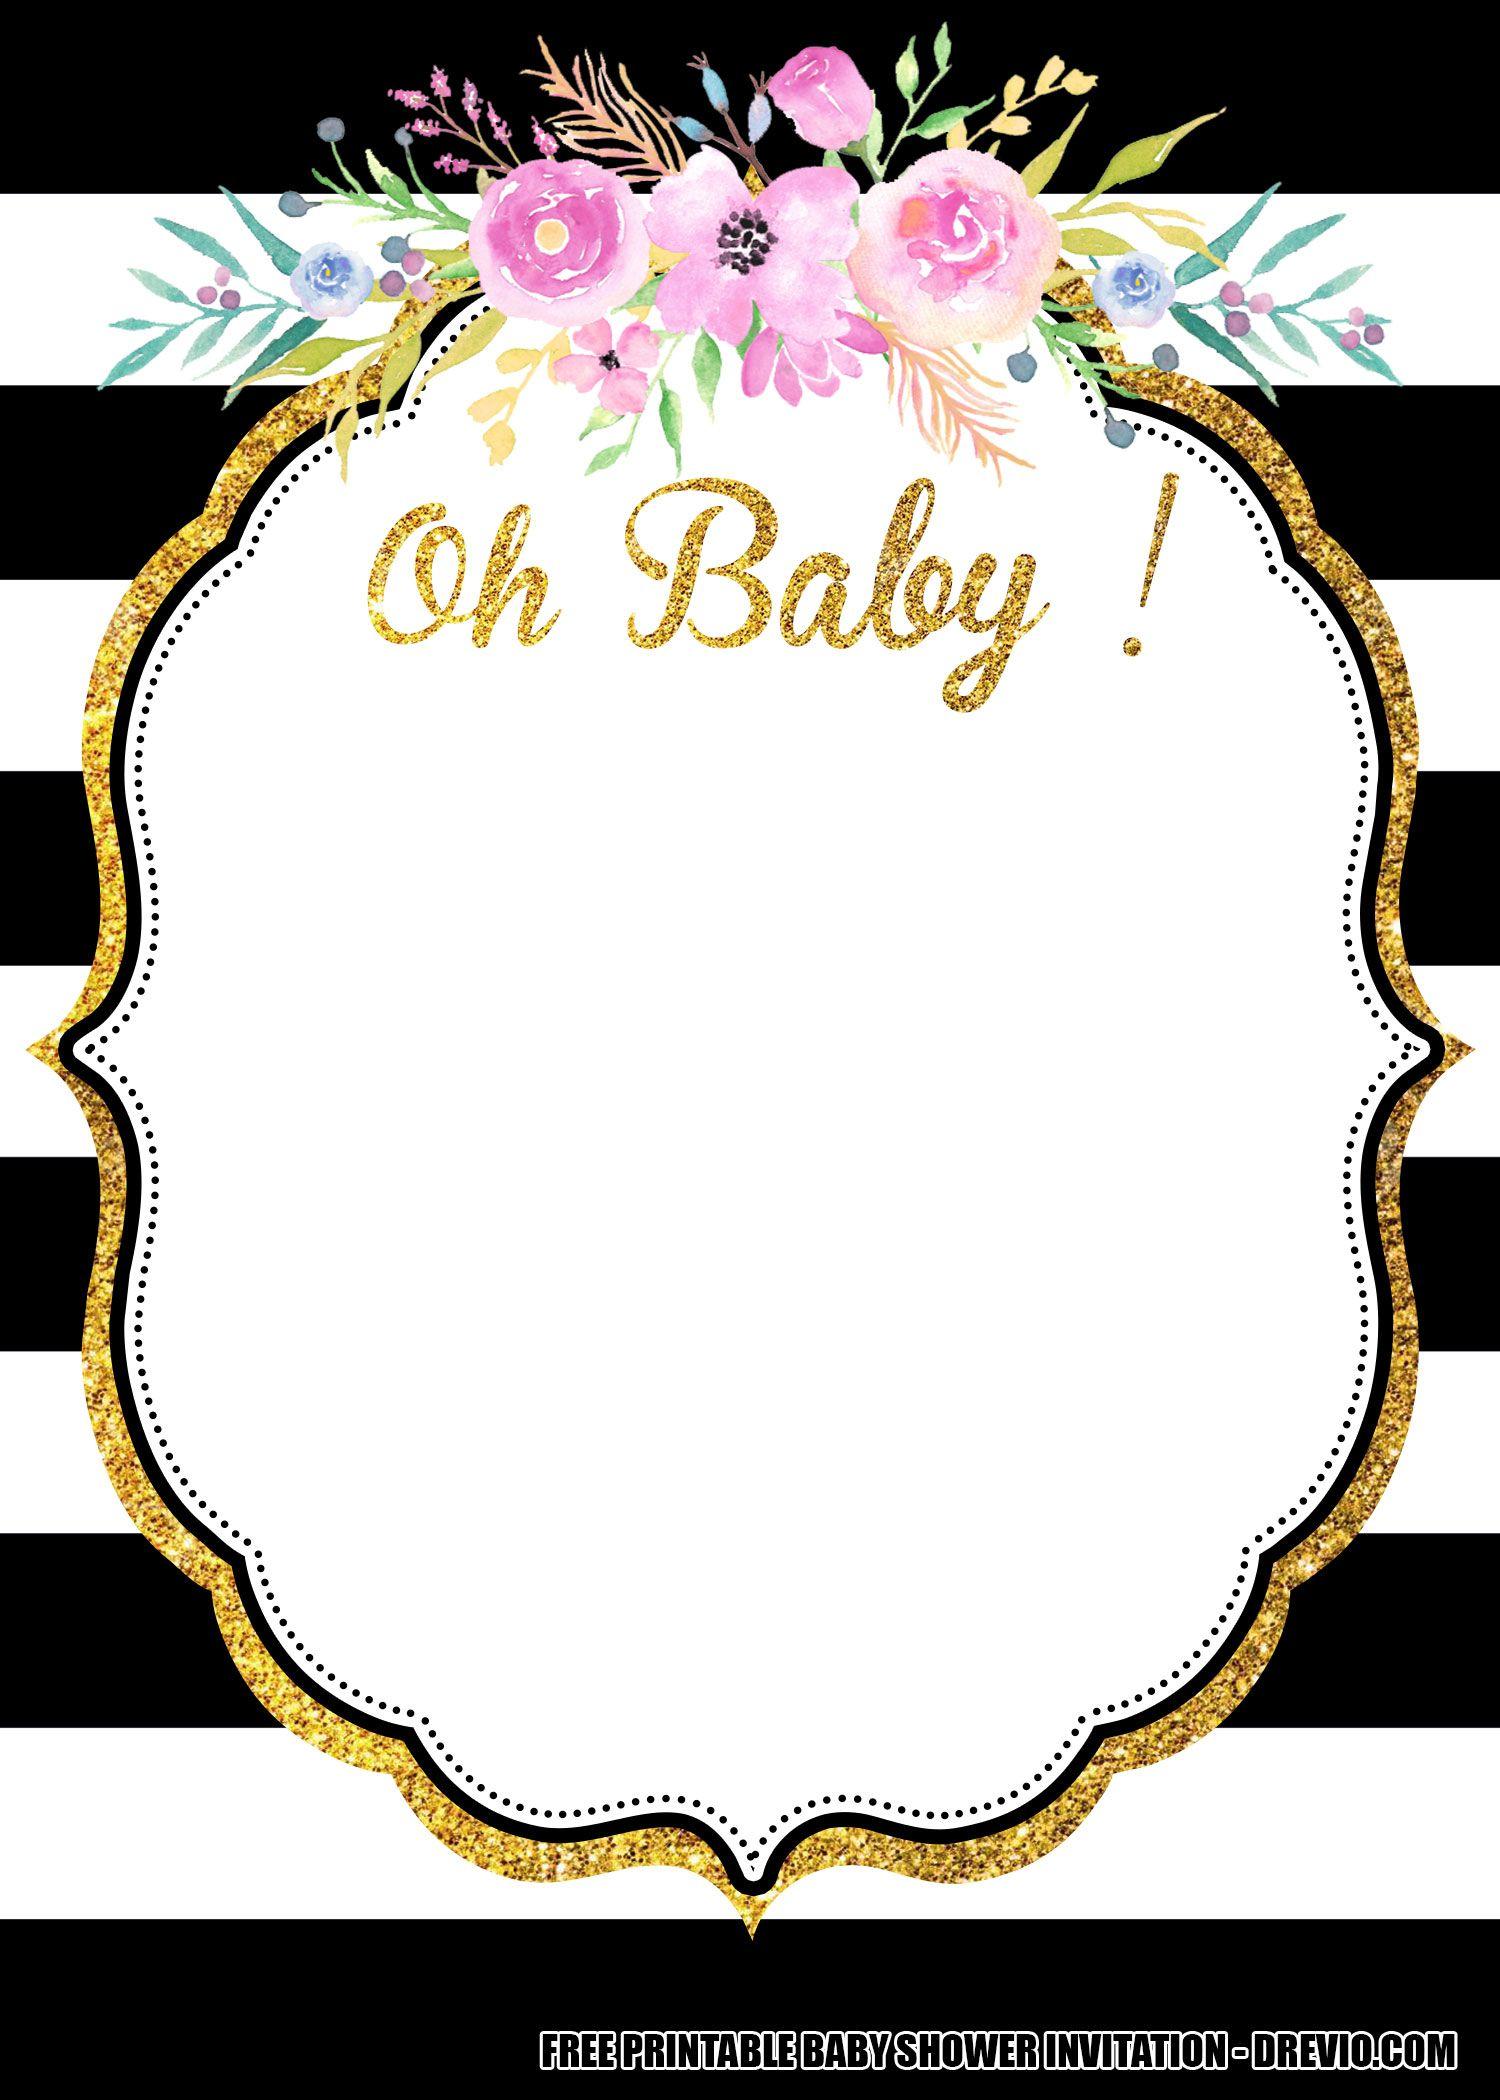 Free Flower Baby Shower Invitation Templates Downloadable Flower Baby Shower Invites Printable Baby Shower Invitations Free Printable Baby Shower Invitations